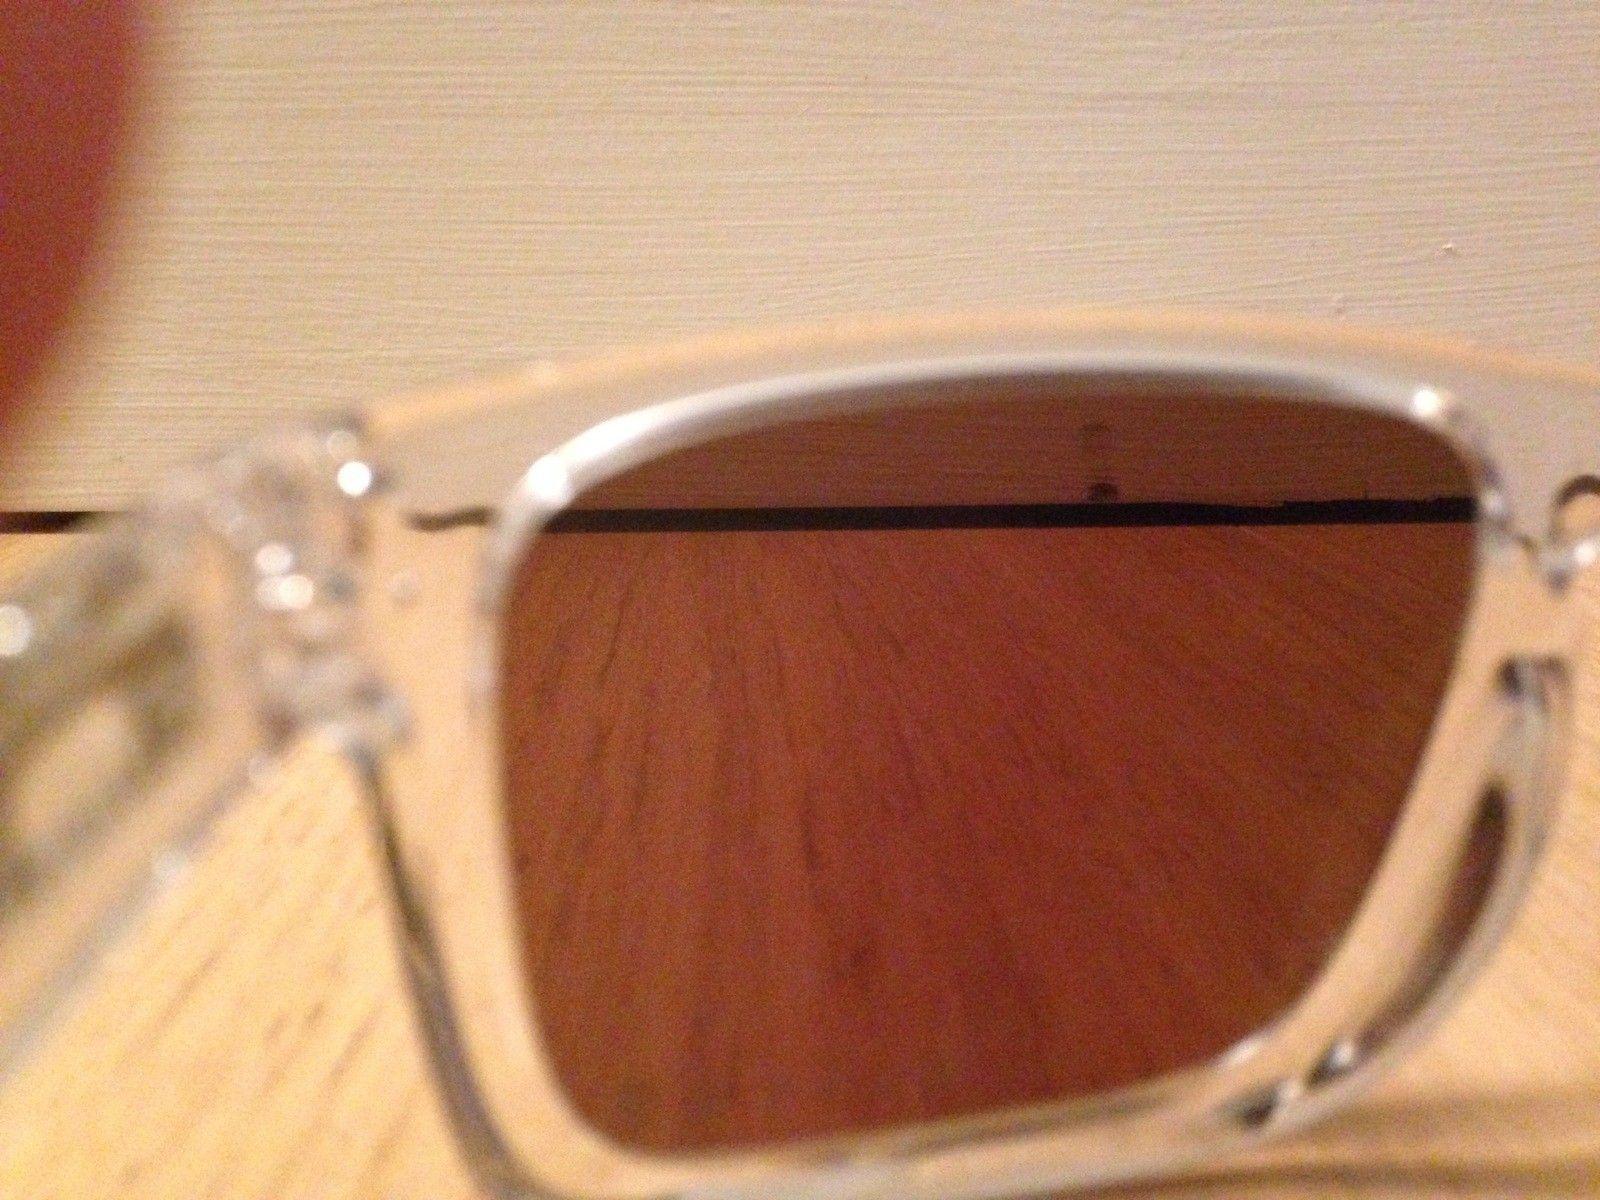 Revant Optics HC3 Elite Mirrorshield Lens Review - IMG_1736.JPG